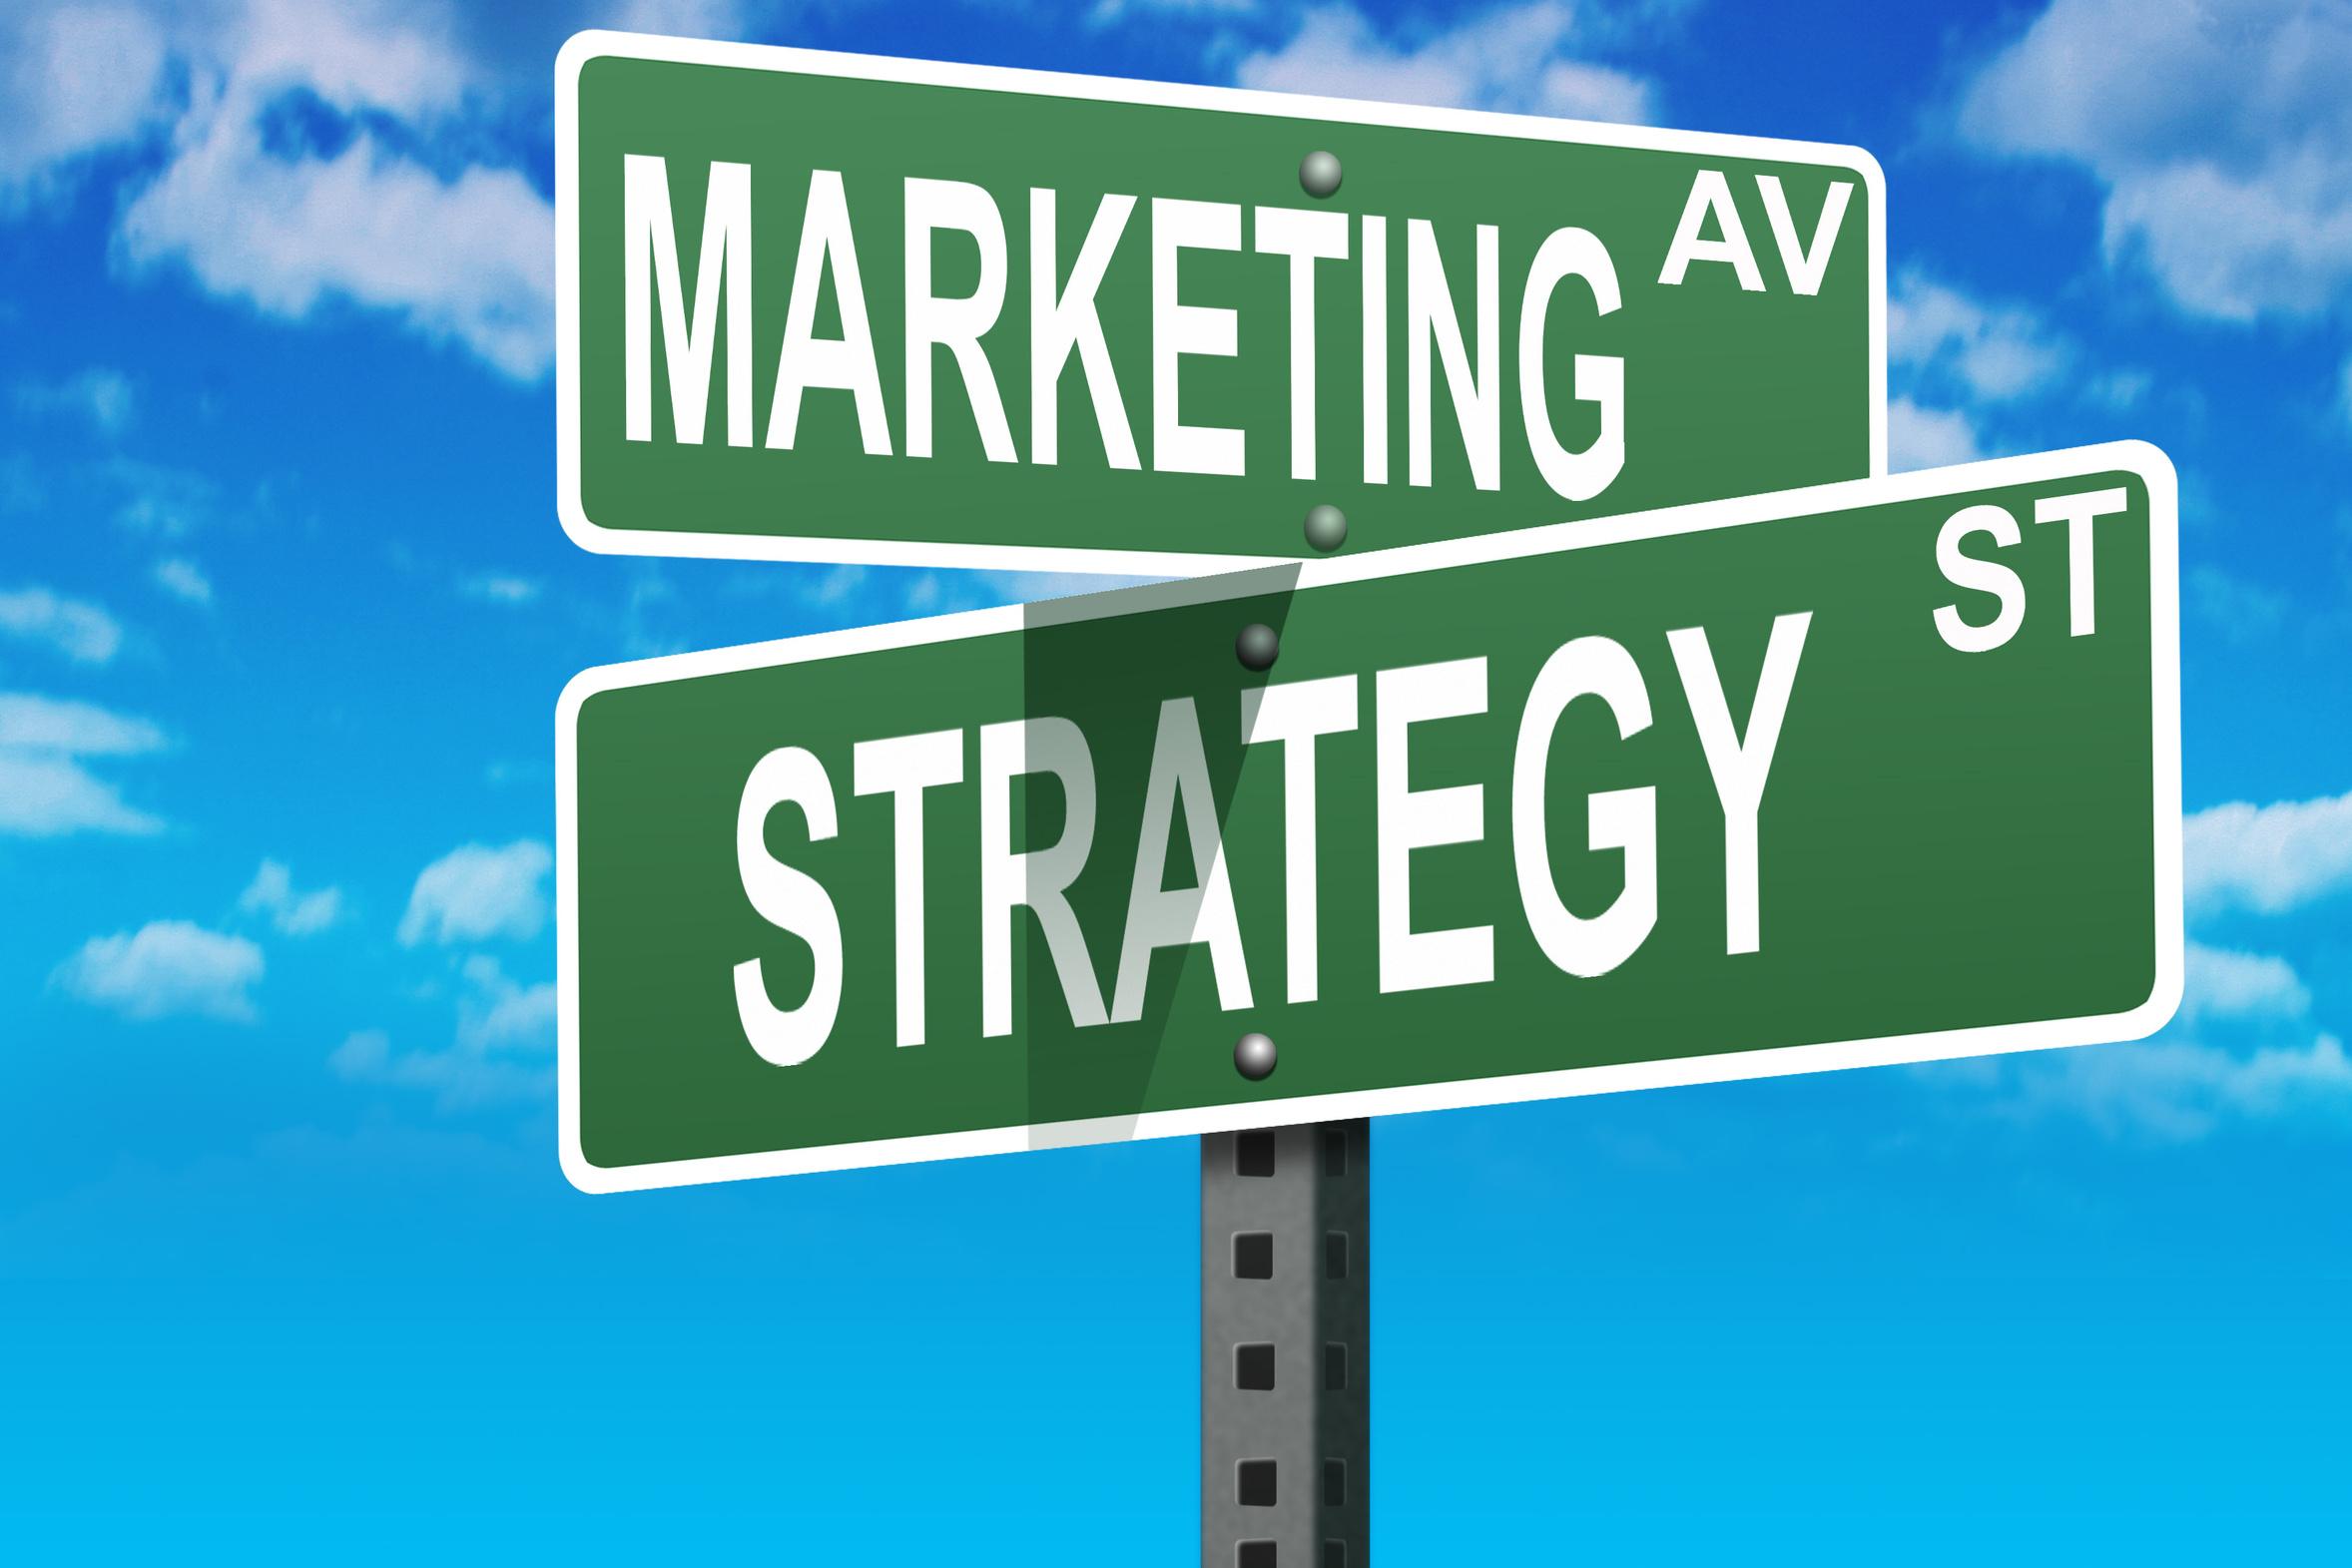 marketing strategy for hilton hotel Hilton strategic management presentation pricing strategies finance marketing additional finance points blackstone acquired hilton hotels in.